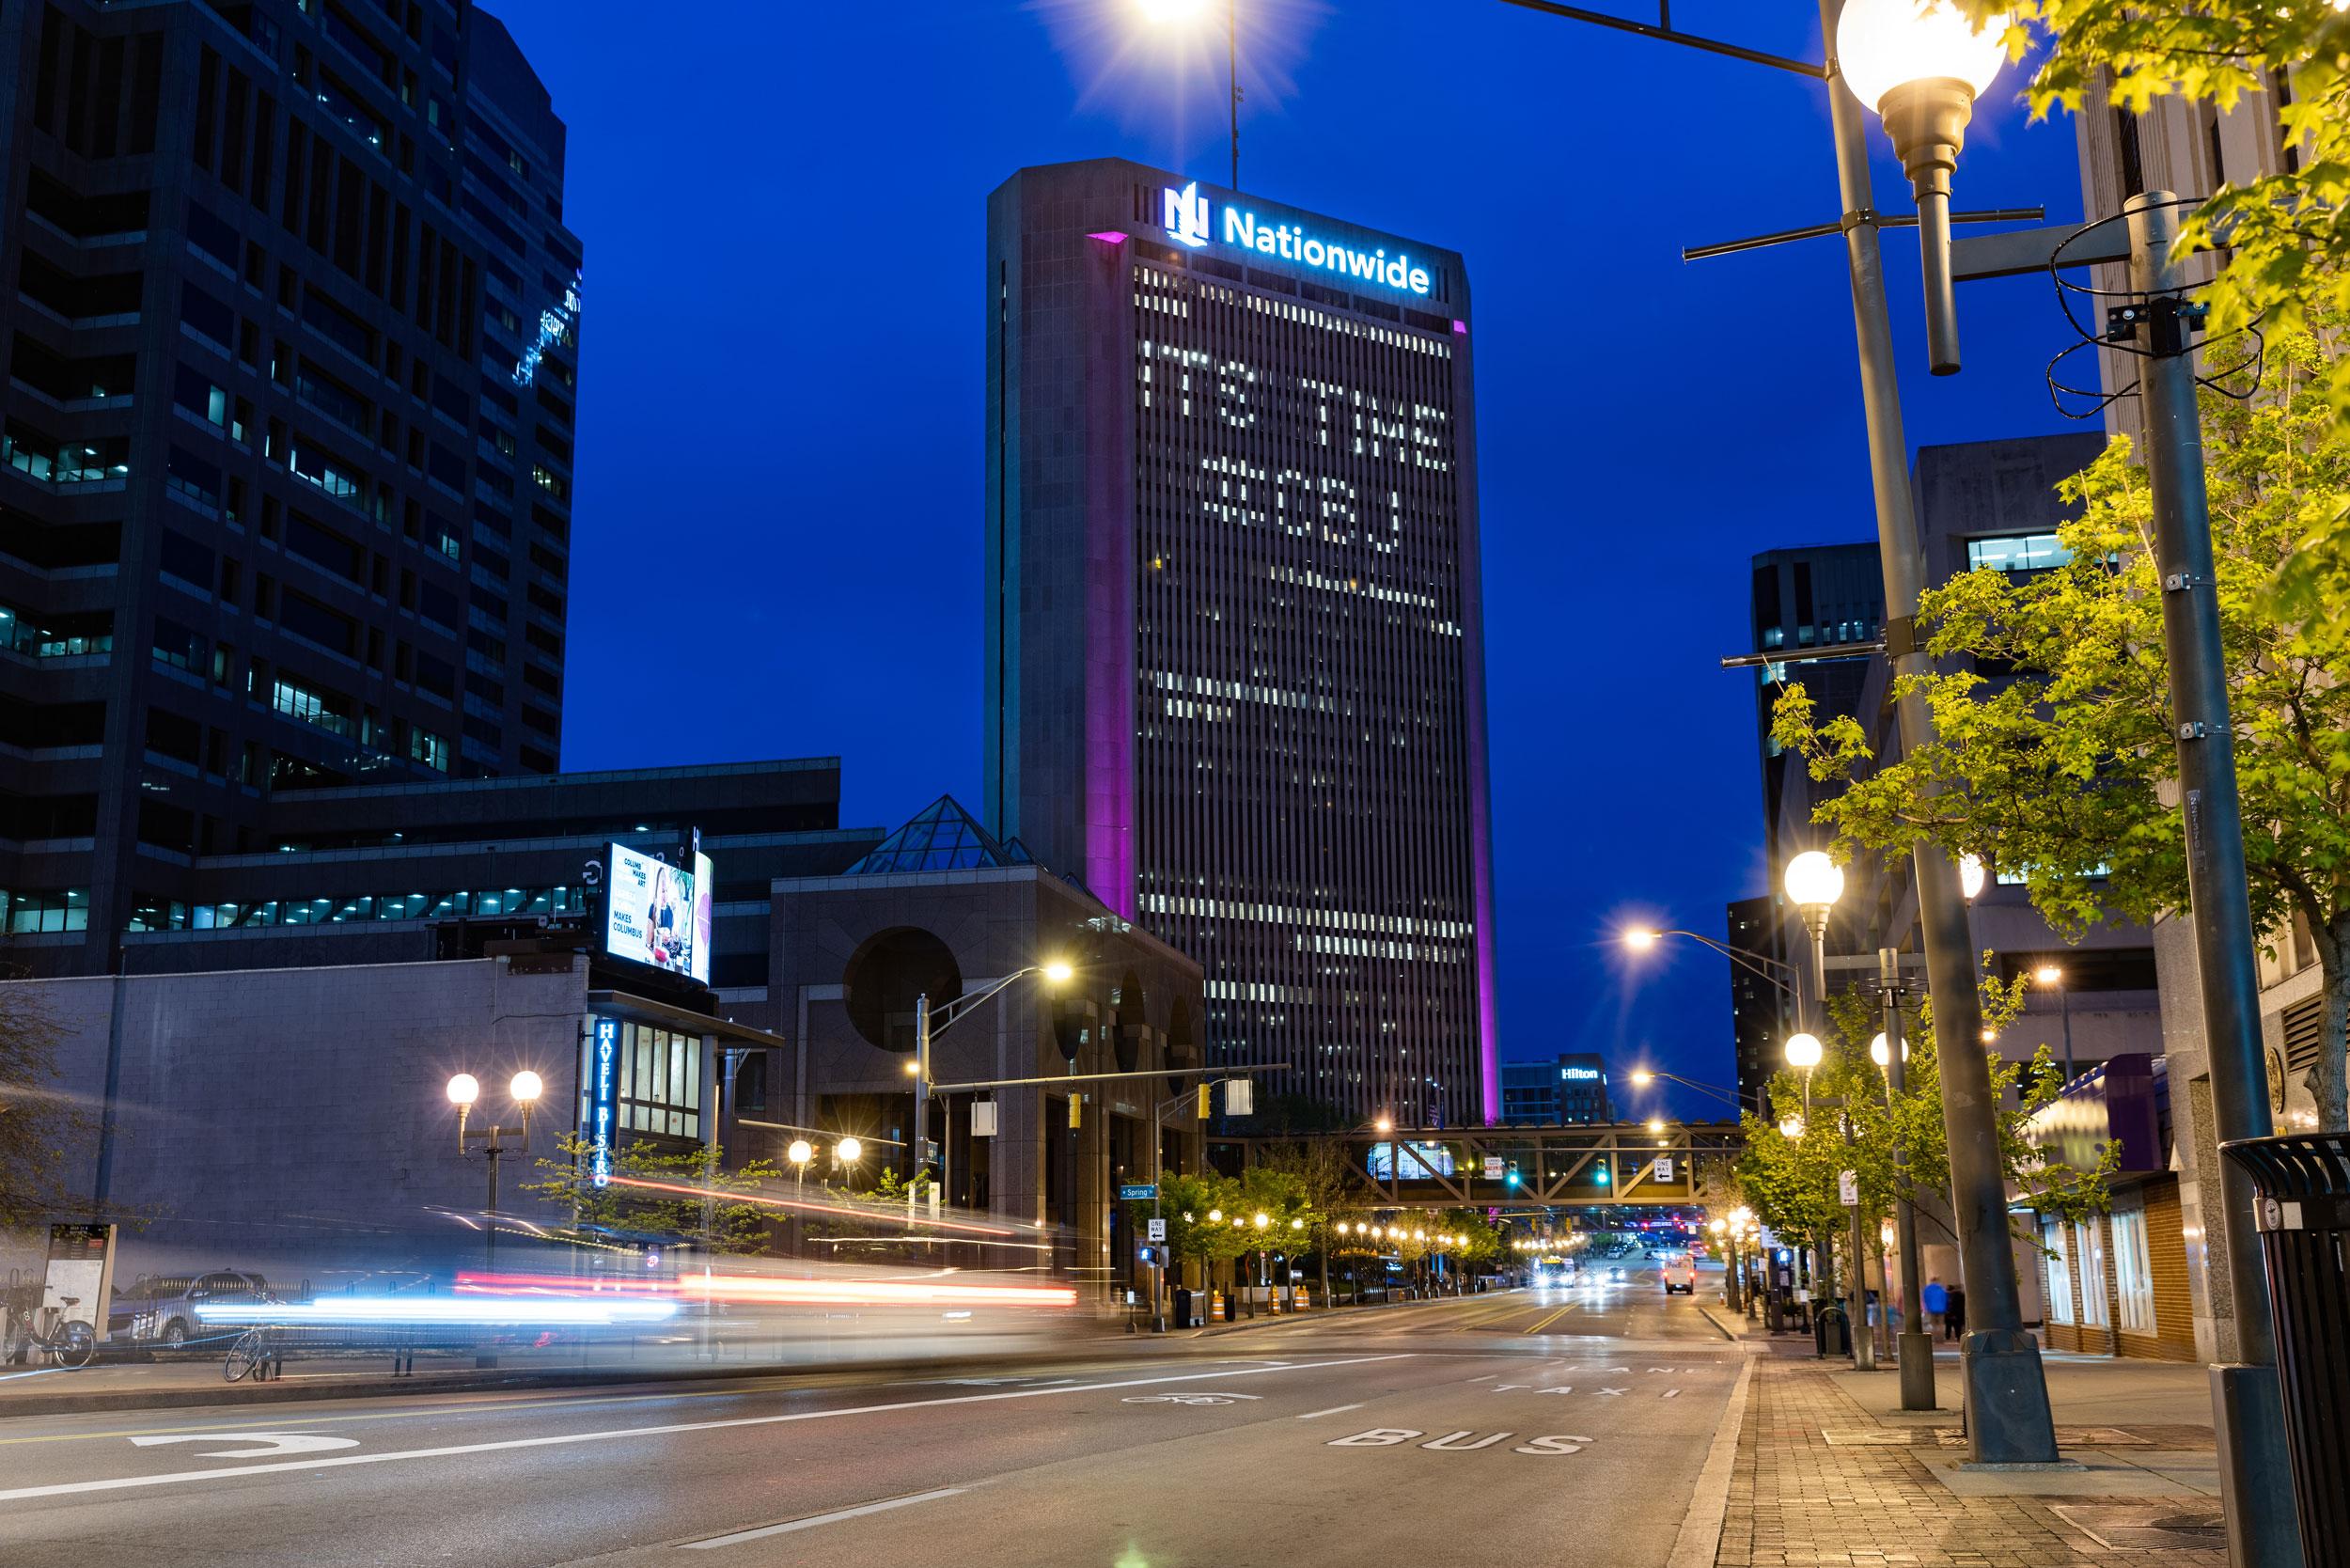 Nationwide, Columbus, Ohio, CBJ, night, long exposure